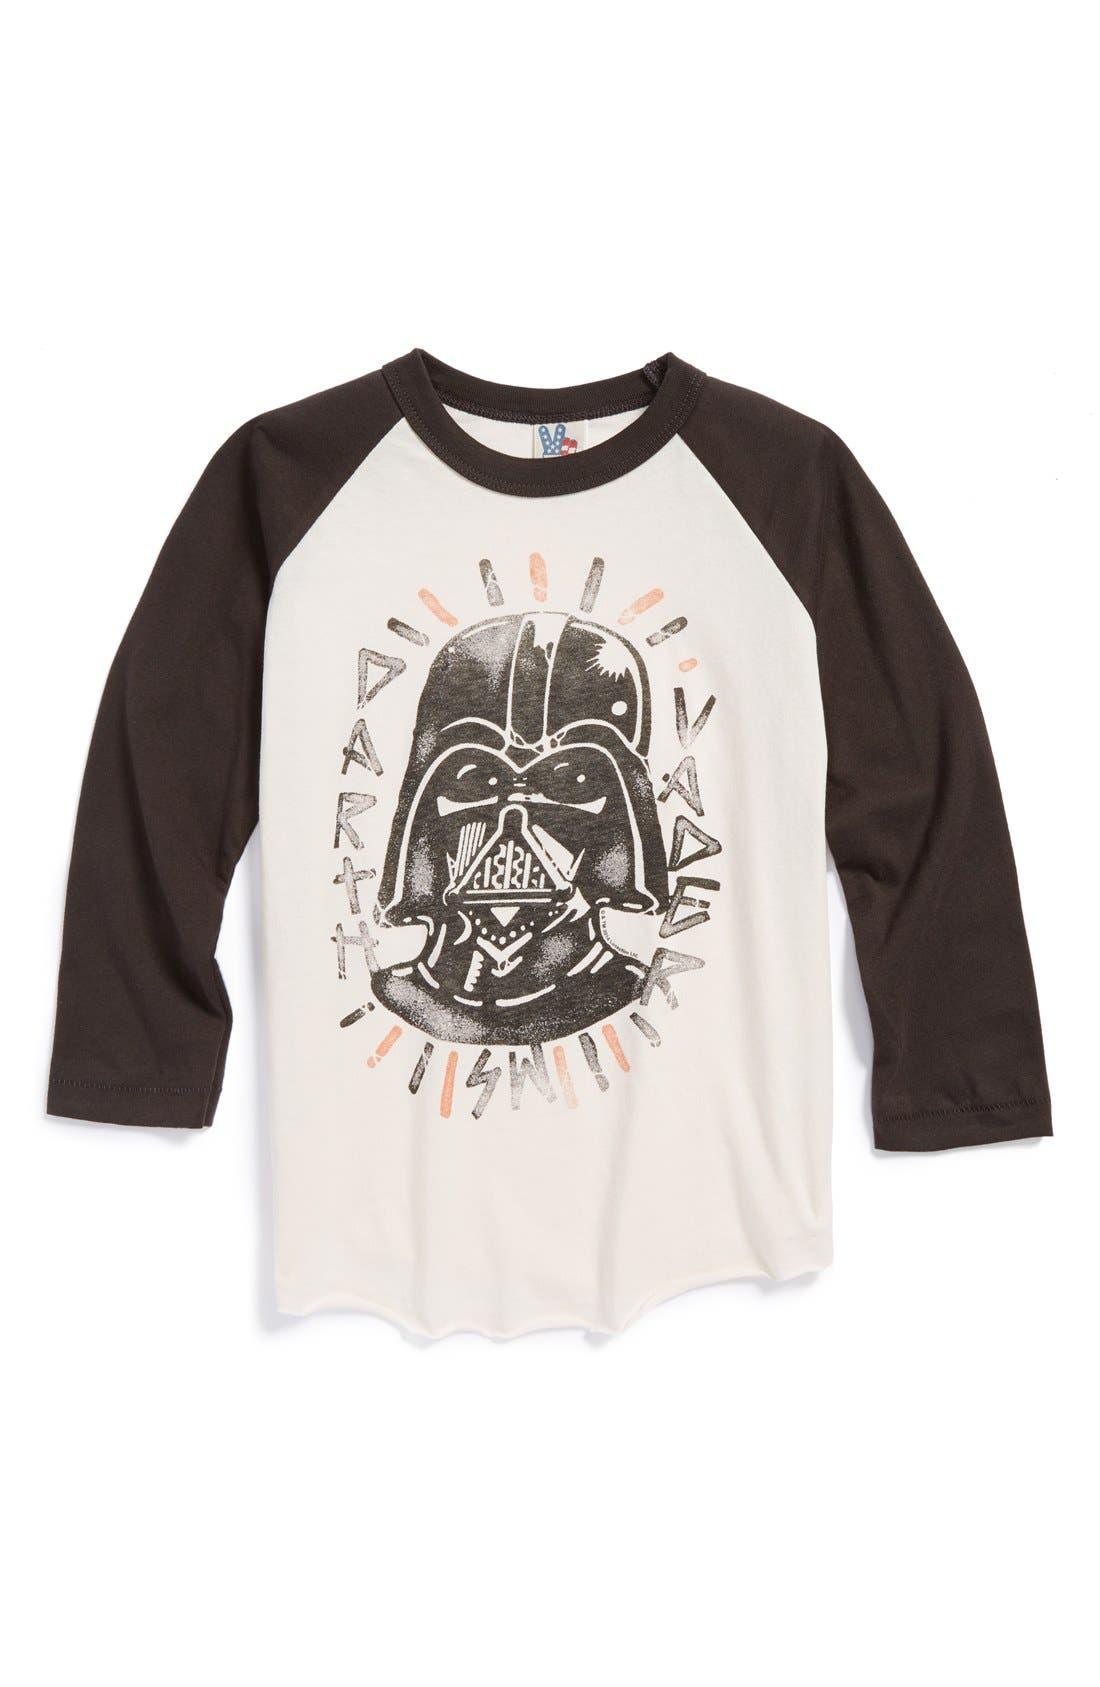 Alternate Image 1 Selected - Junk Food 'Darth Vader' T-Shirt (Toddler Boys)